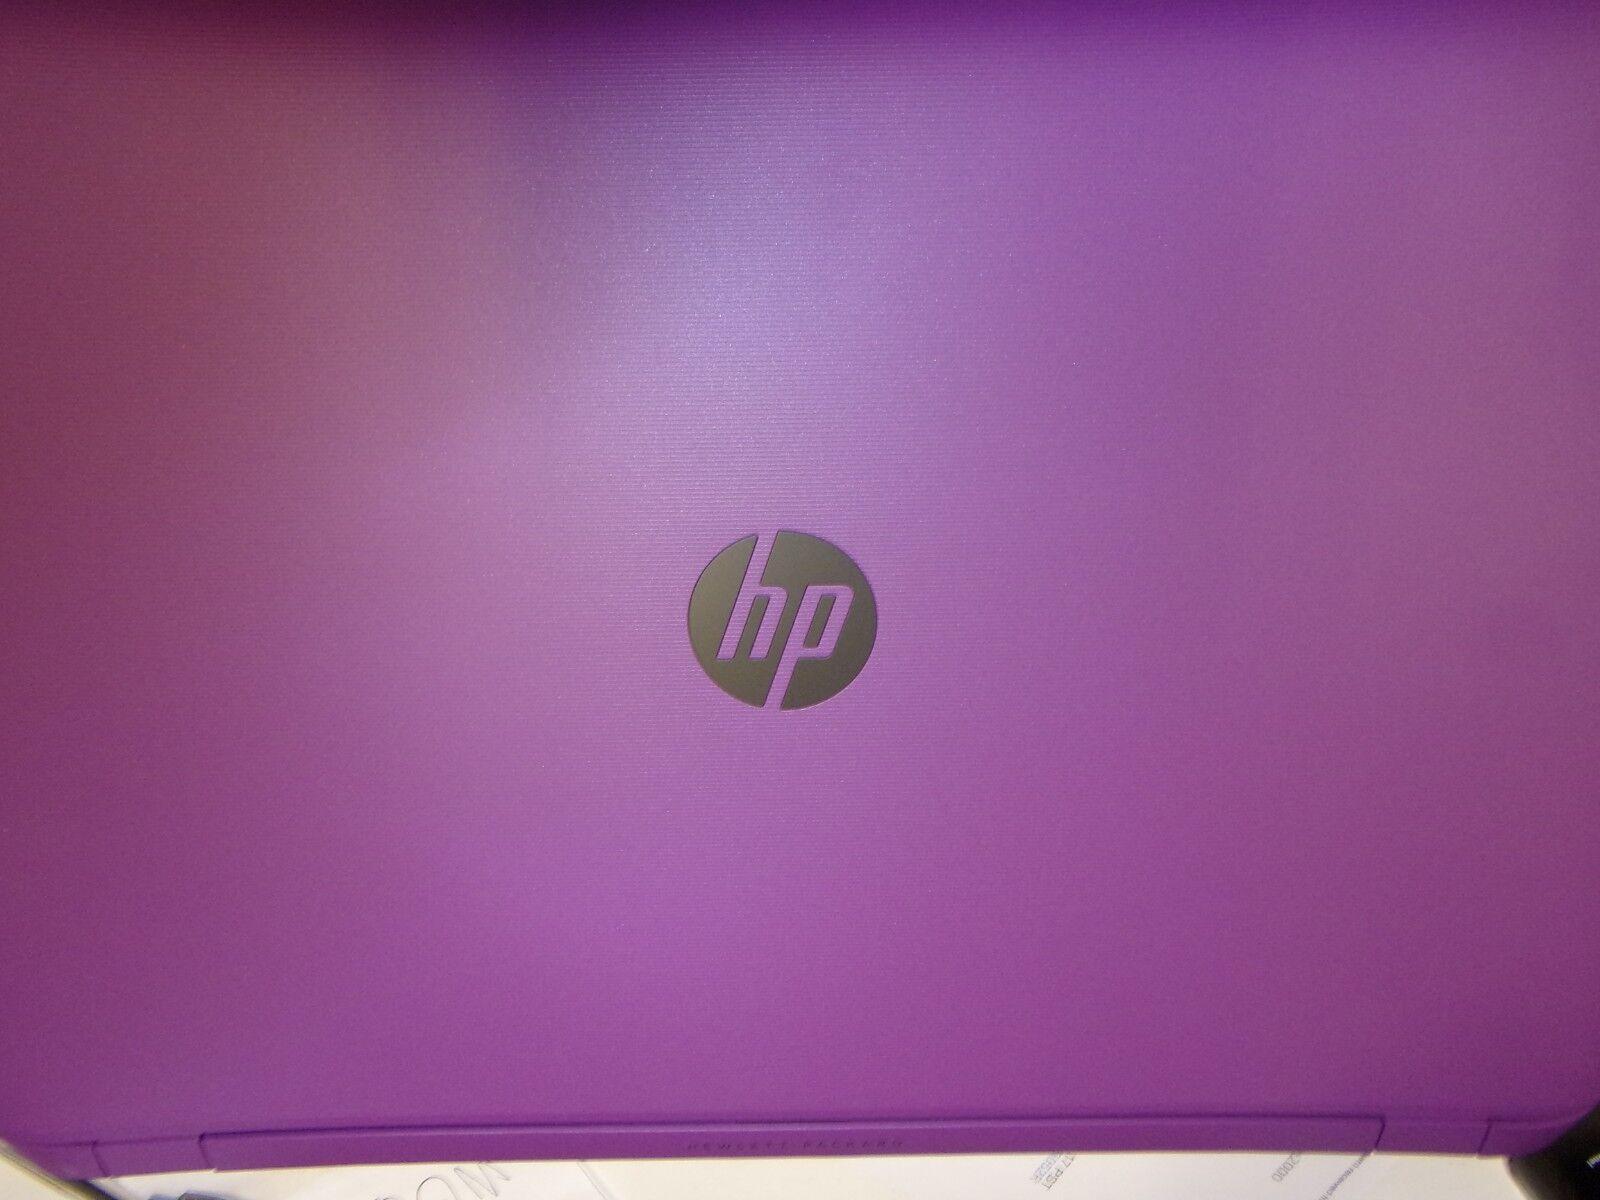 HP, J9N58UAR#ABA,  Pavilion 17, Notebook PC,  1 TB HD, 8GB RAM, Win 8.1,